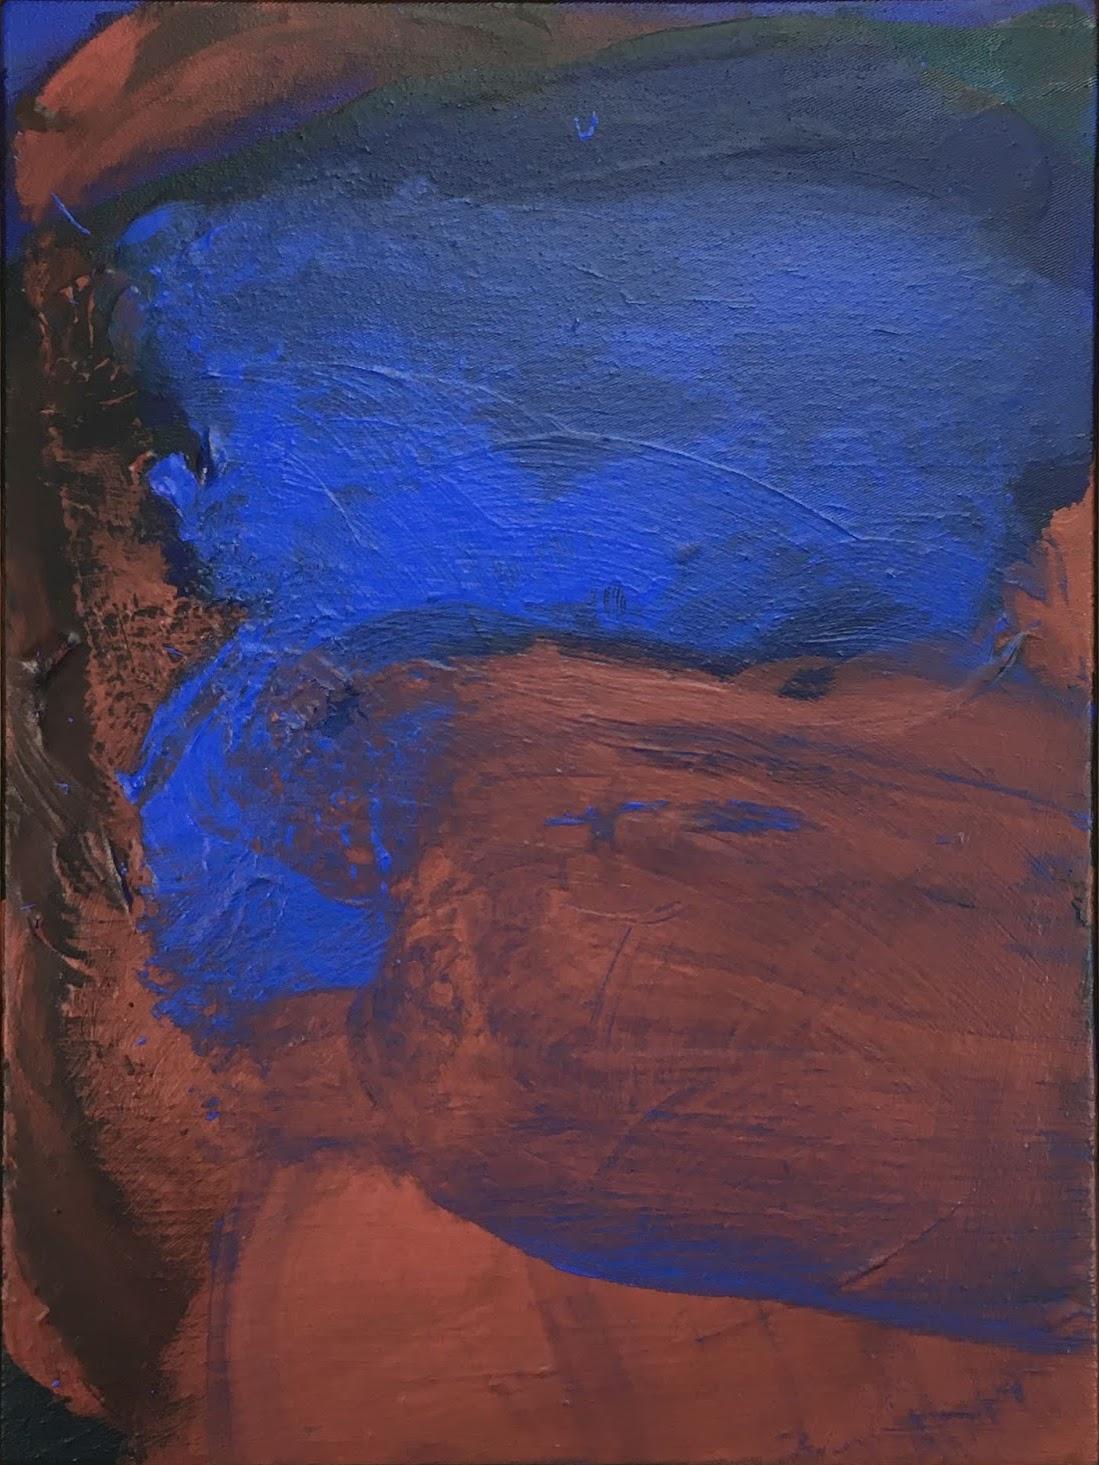 jean baptiste besancon painting 65.jpg